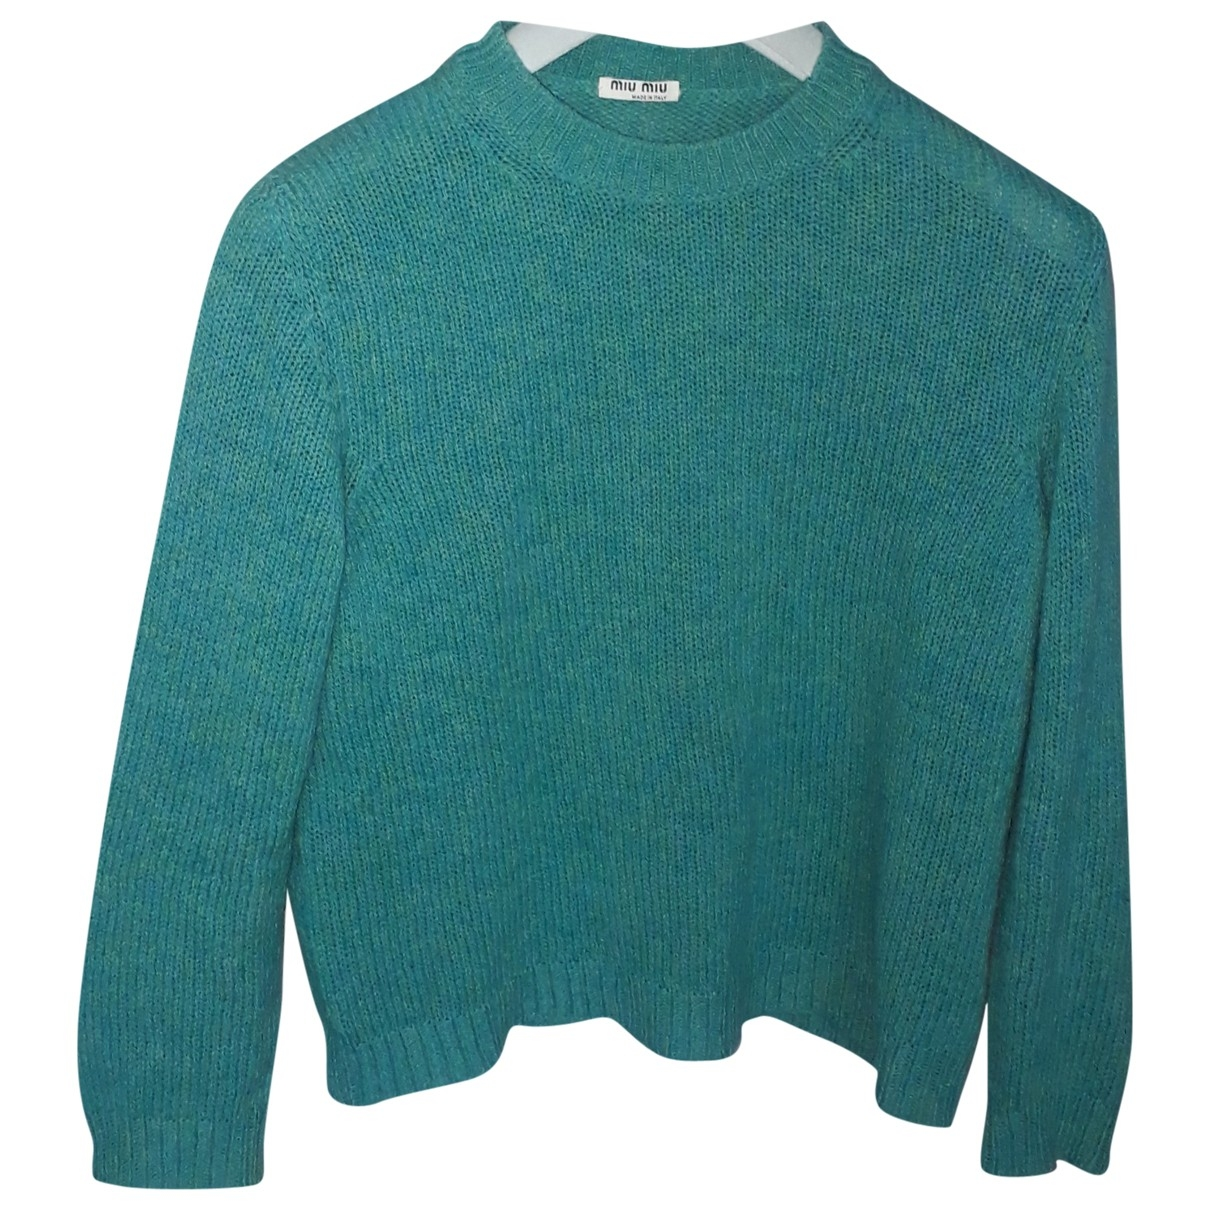 Miu Miu \N Turquoise Wool Knitwear for Women 40 IT